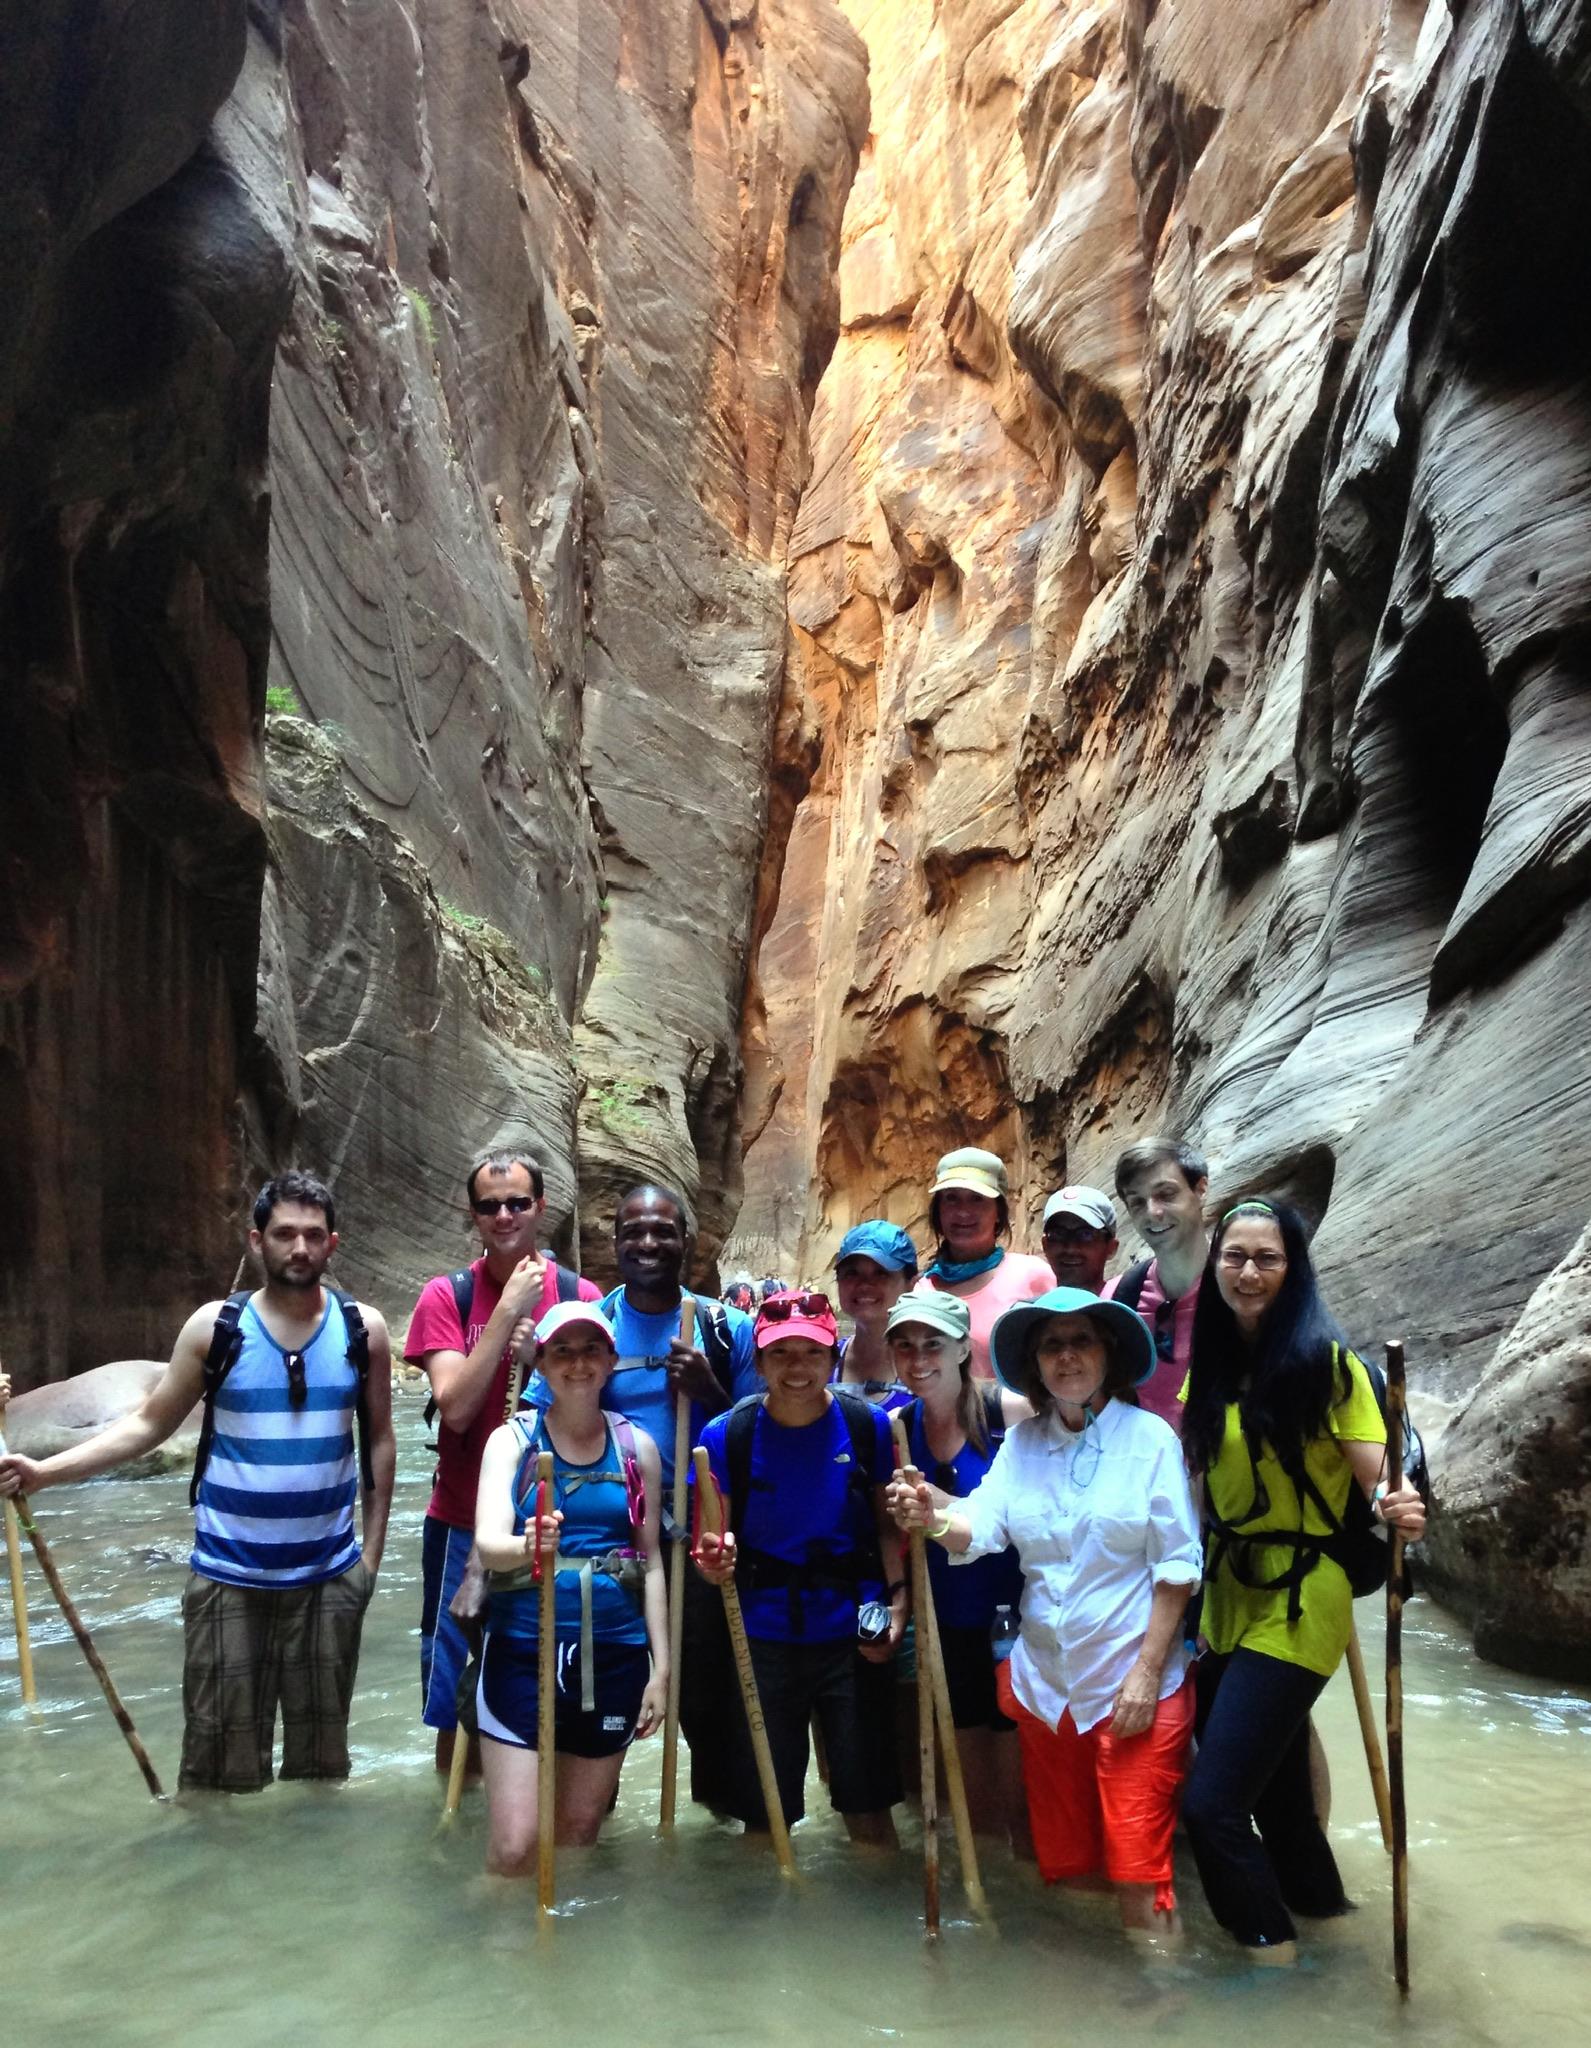 Family and friends hike in Utah